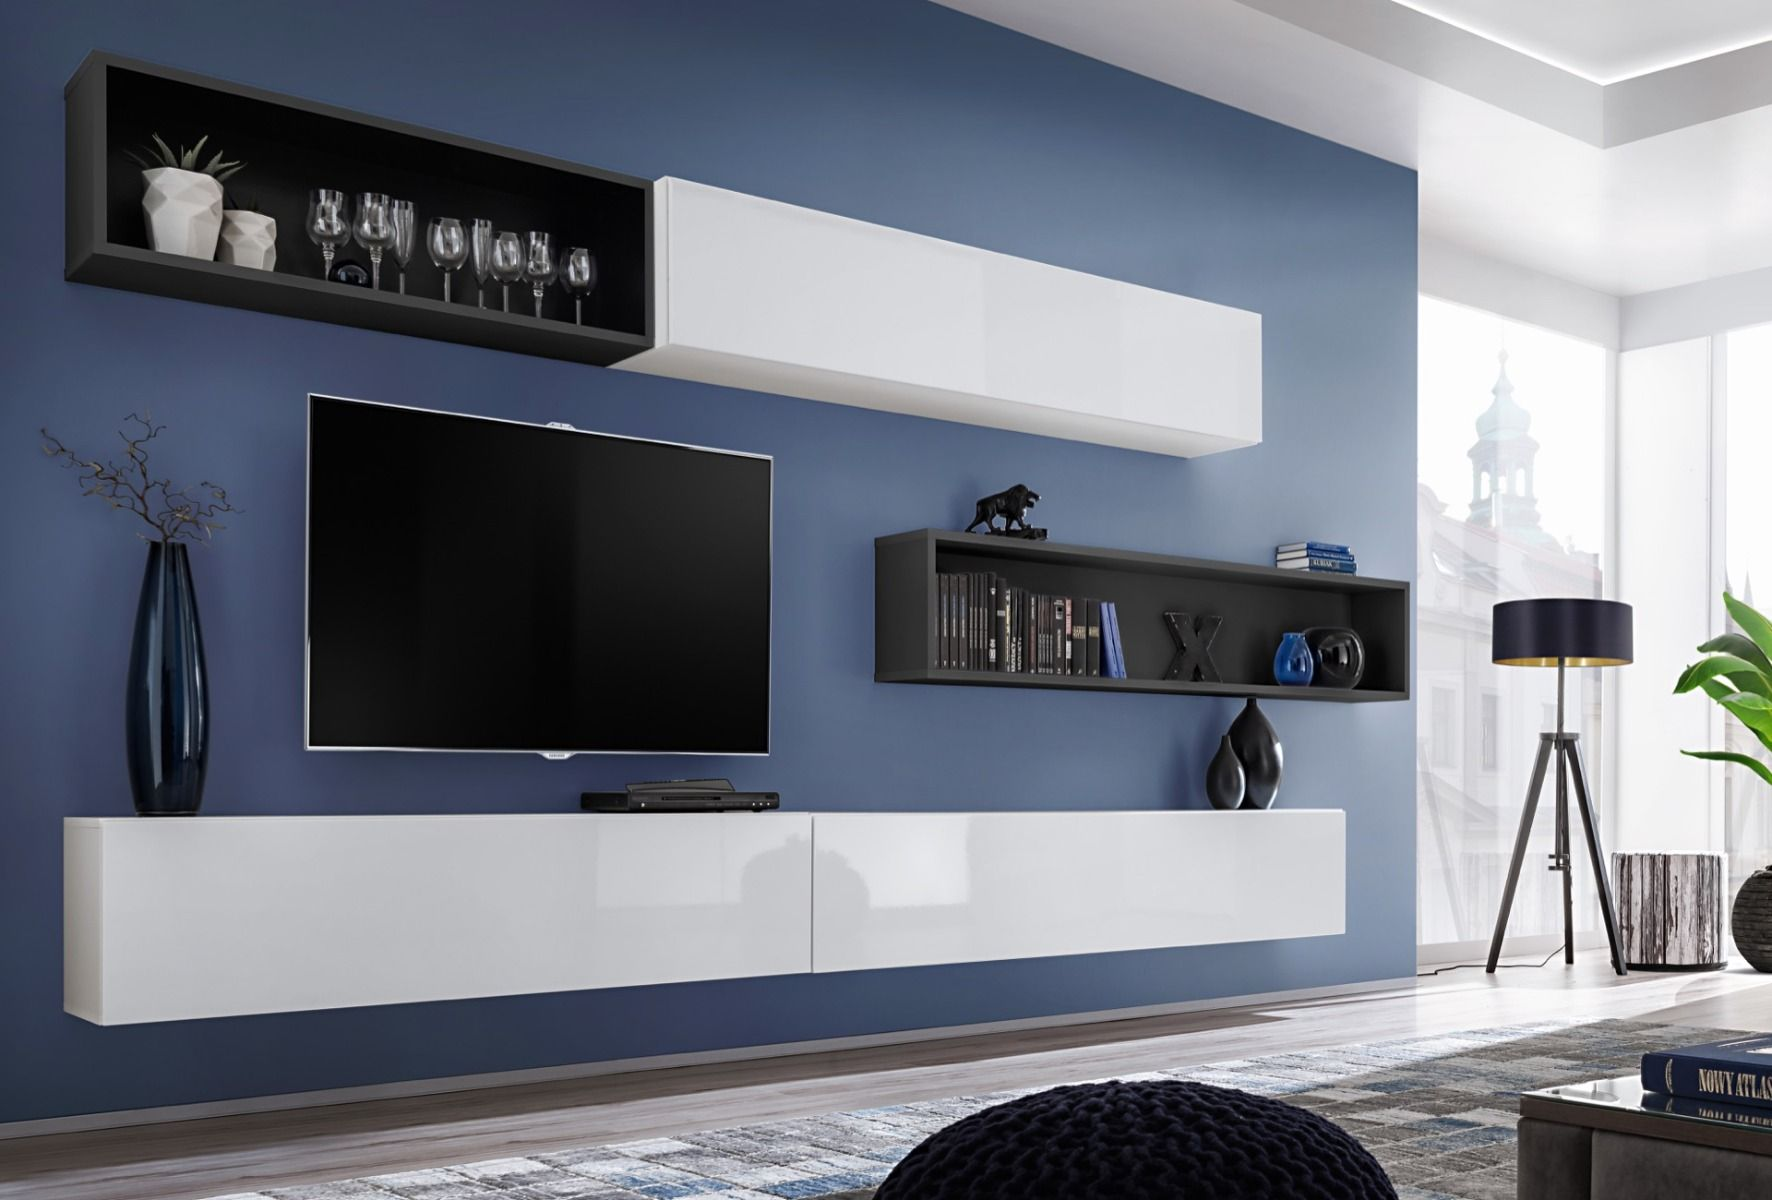 Meuble Tv Mural Meuble Tv Moderne Meuble Tv Hifi Meuble Tv Meubles Tv Design Meuble De Television Meuble Tel Moderne Tv Muur Kast Ontwerpen Meubels